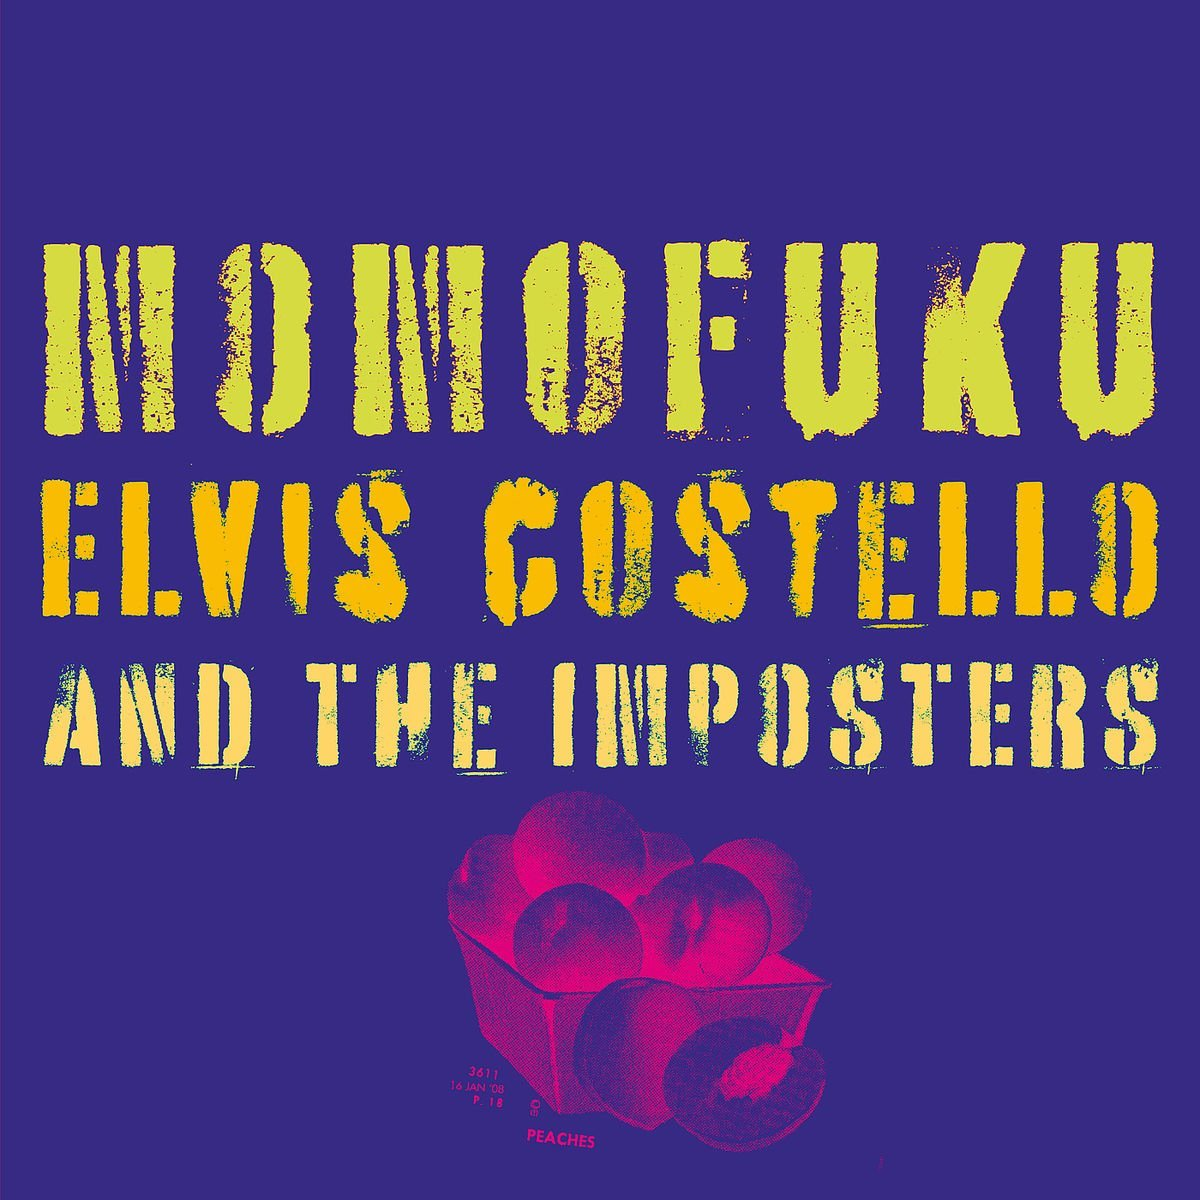 ElvisCostelloAndTheImposters_Momofuku.jpg